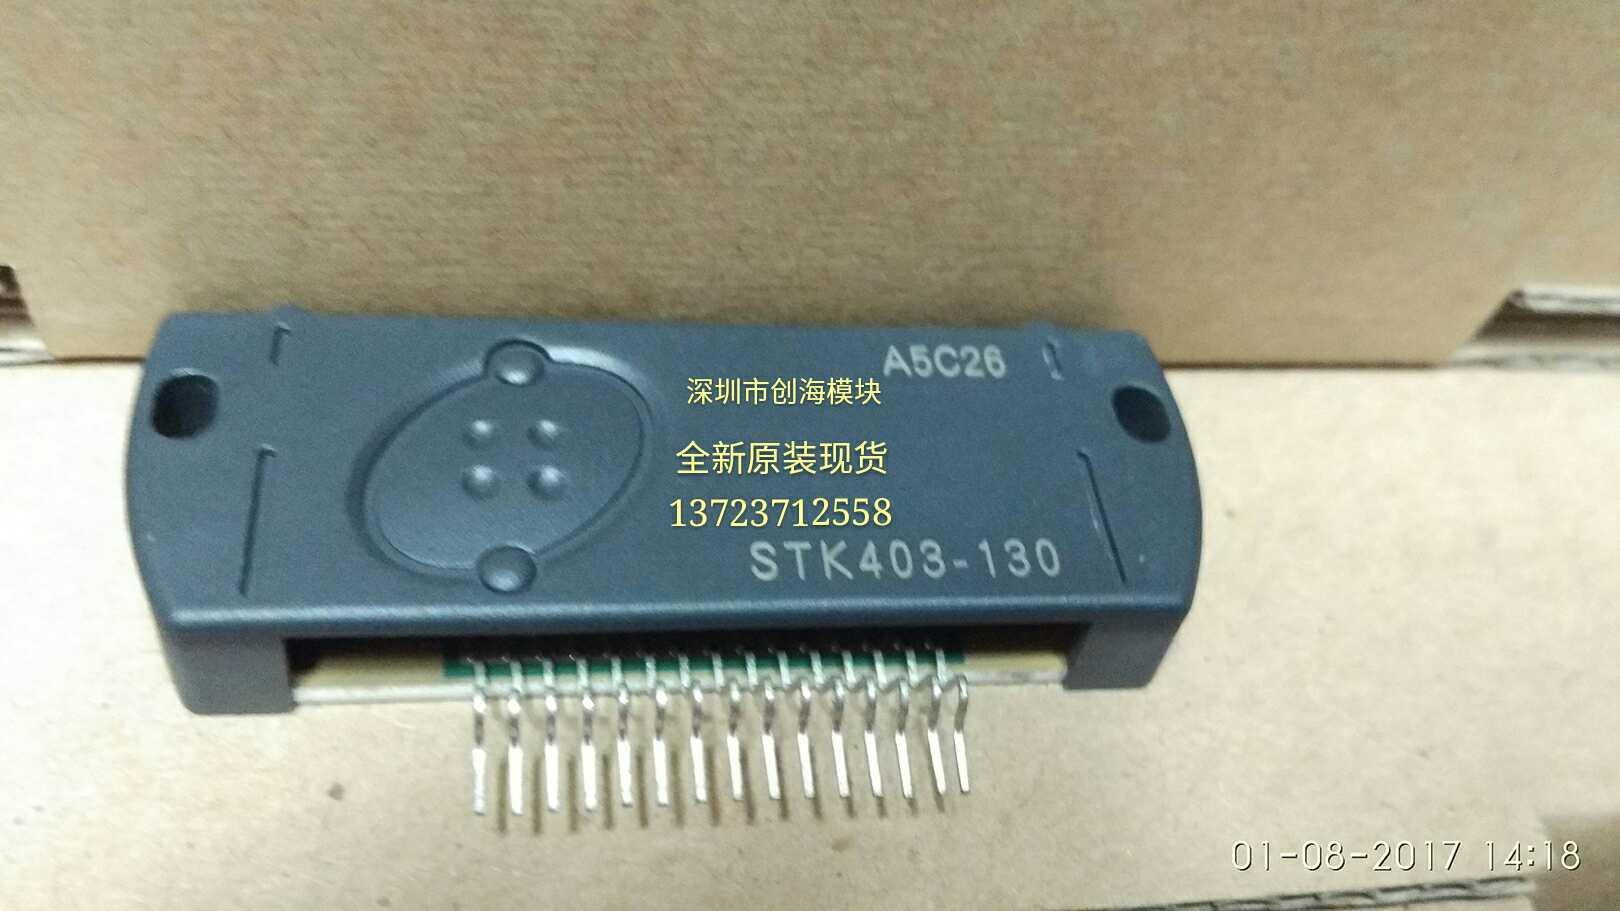 1pcs STK403-130 STK403 AF  OUTPUT MODULE THICK FILM IC DARLINGTON  PACK Accessories new original free shipping 6d50a 120elx 50a1200v 6 element darlington with brake unit module